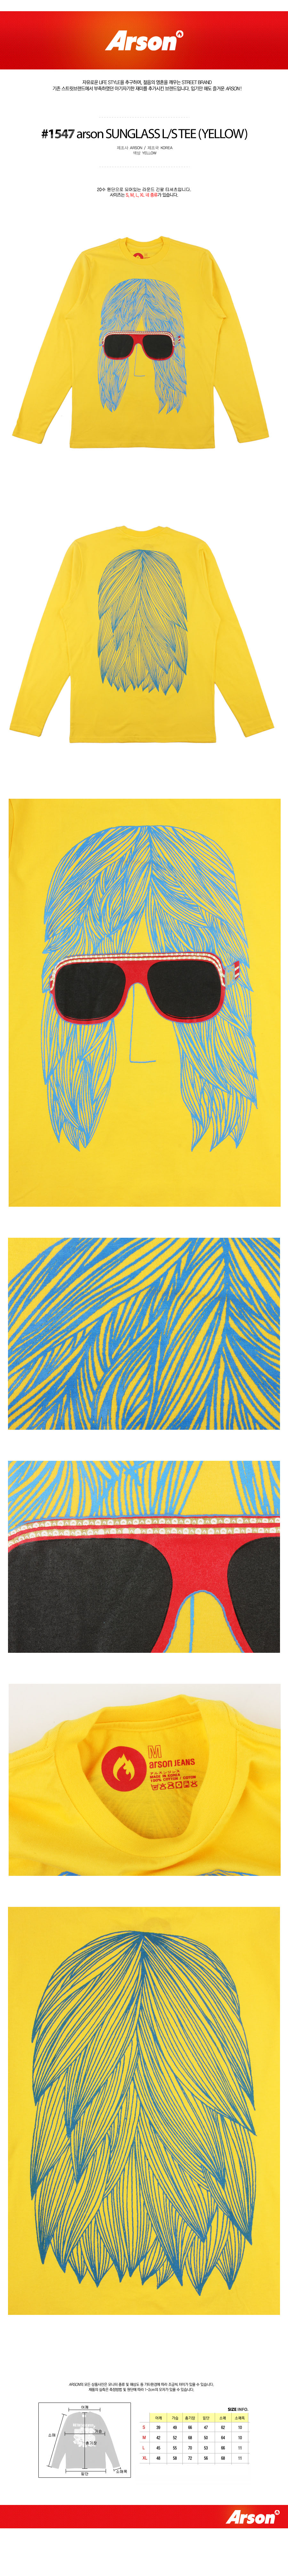 [ ARSON ] [ARSON] 1547 Sunglass longsleeved tshirt